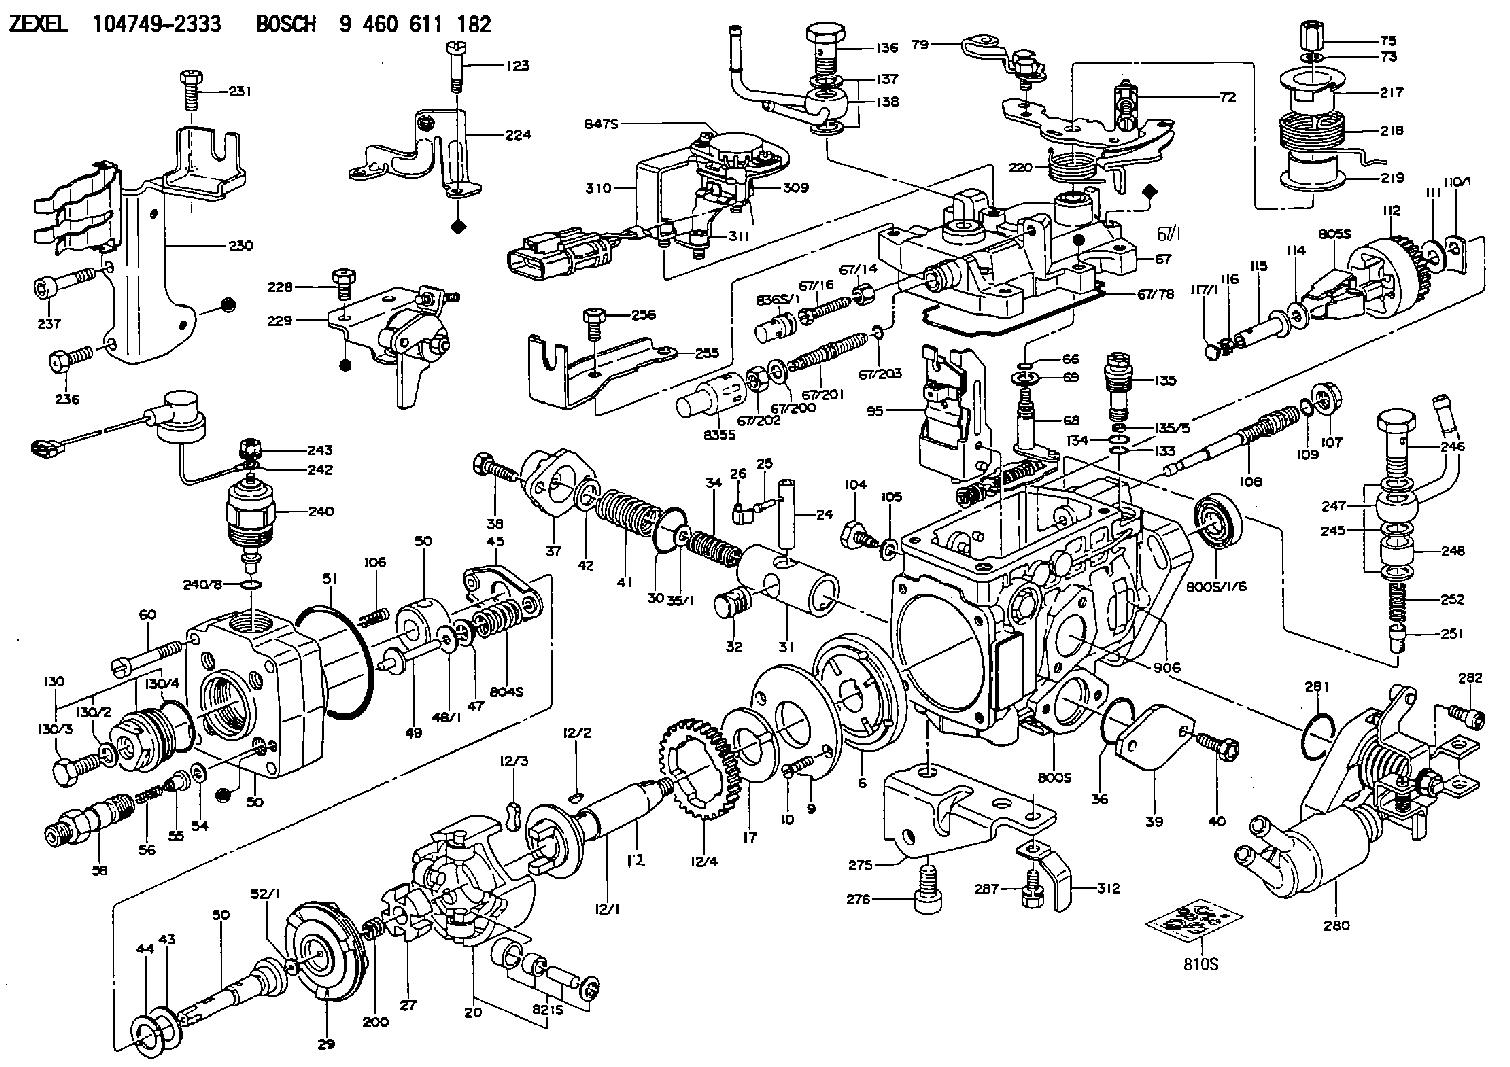 Ch23 Wiring Diagram